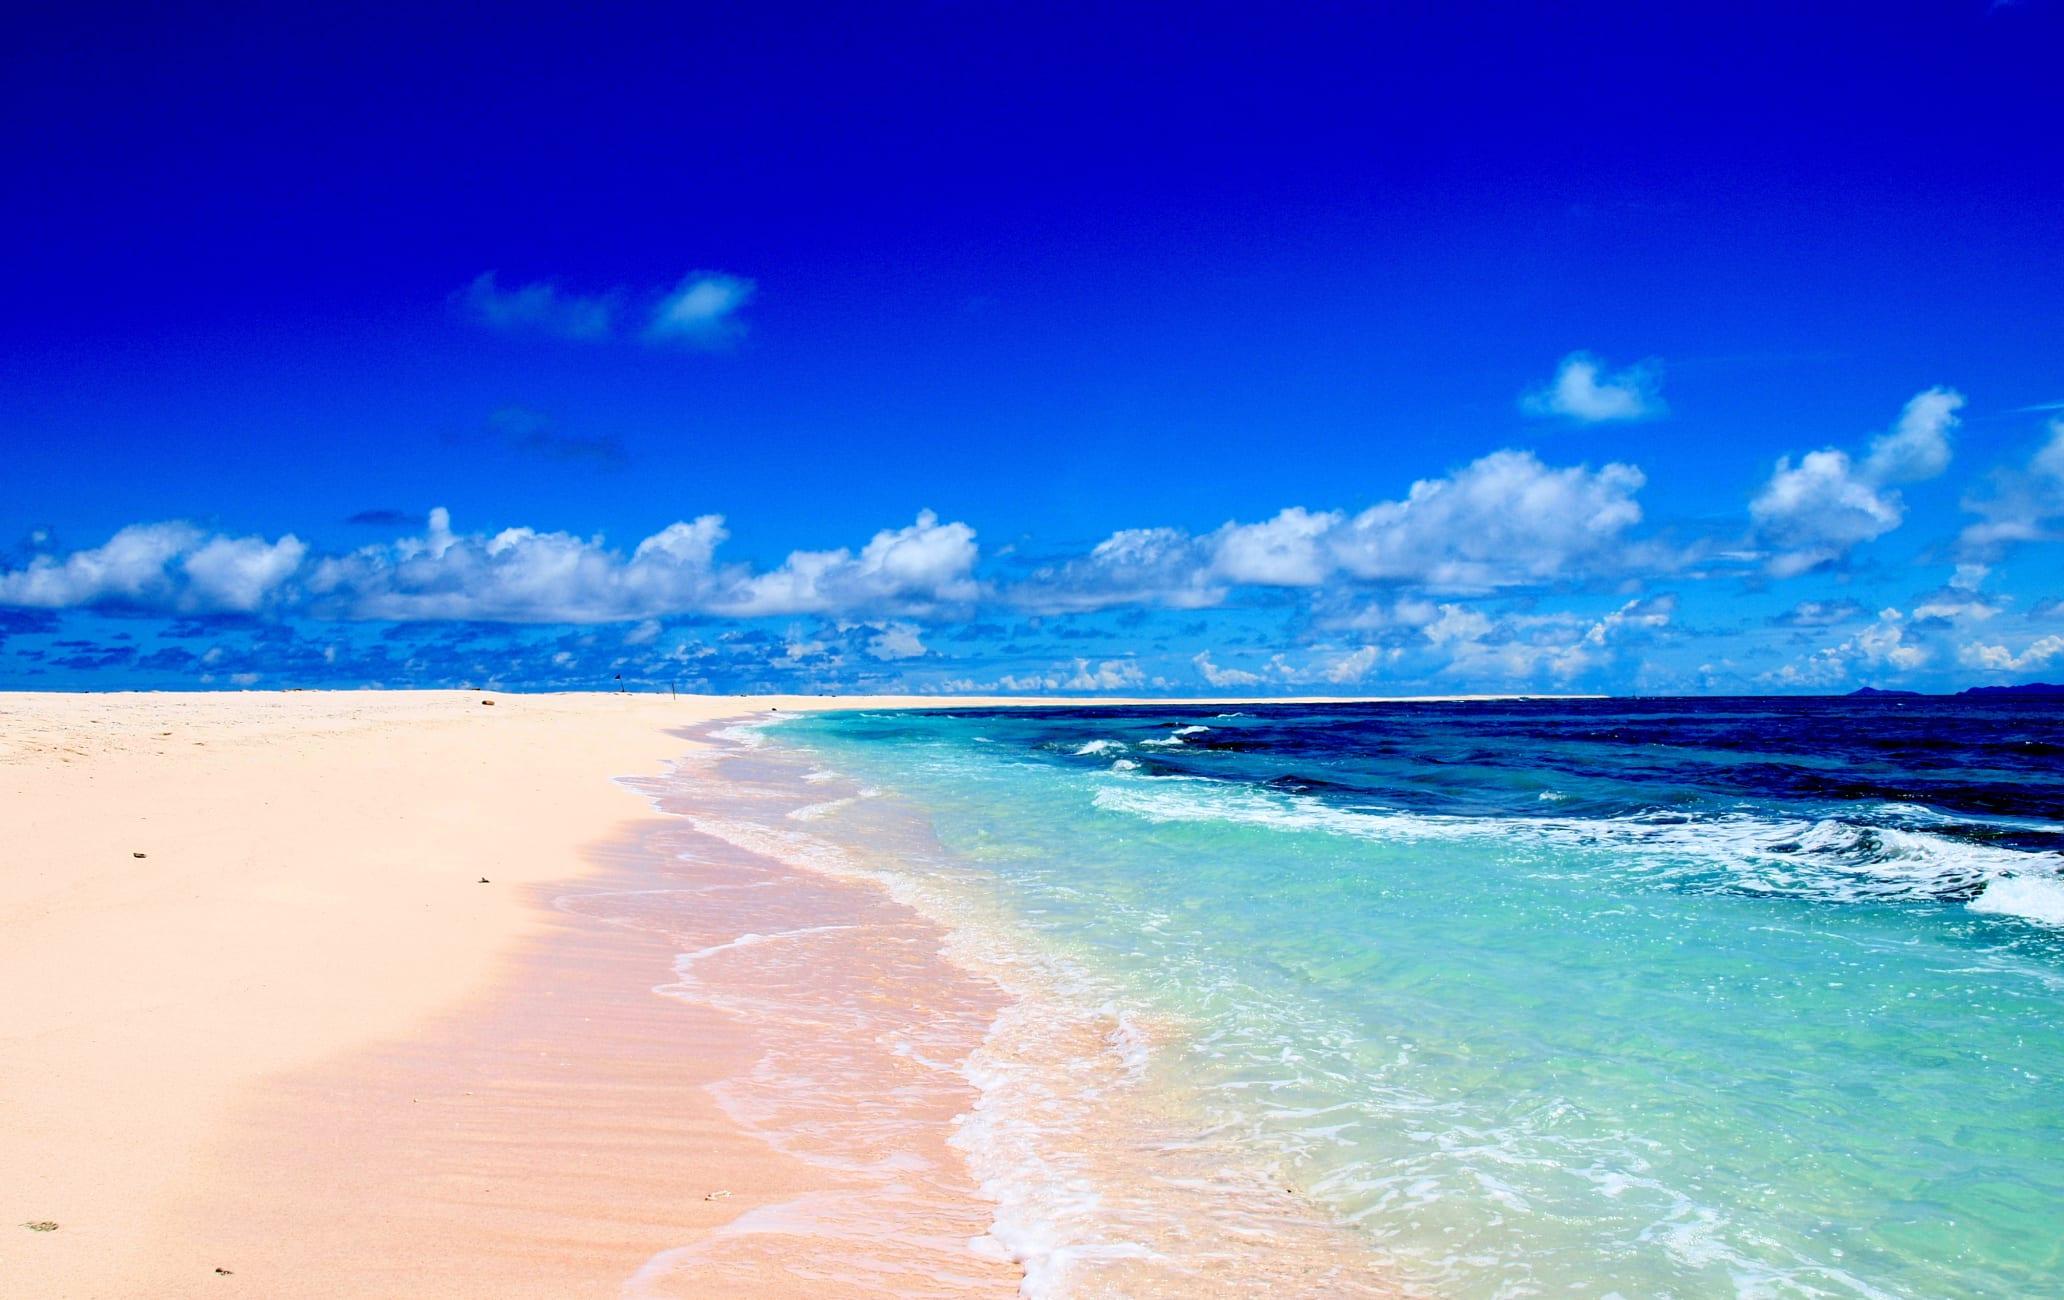 Kume Island